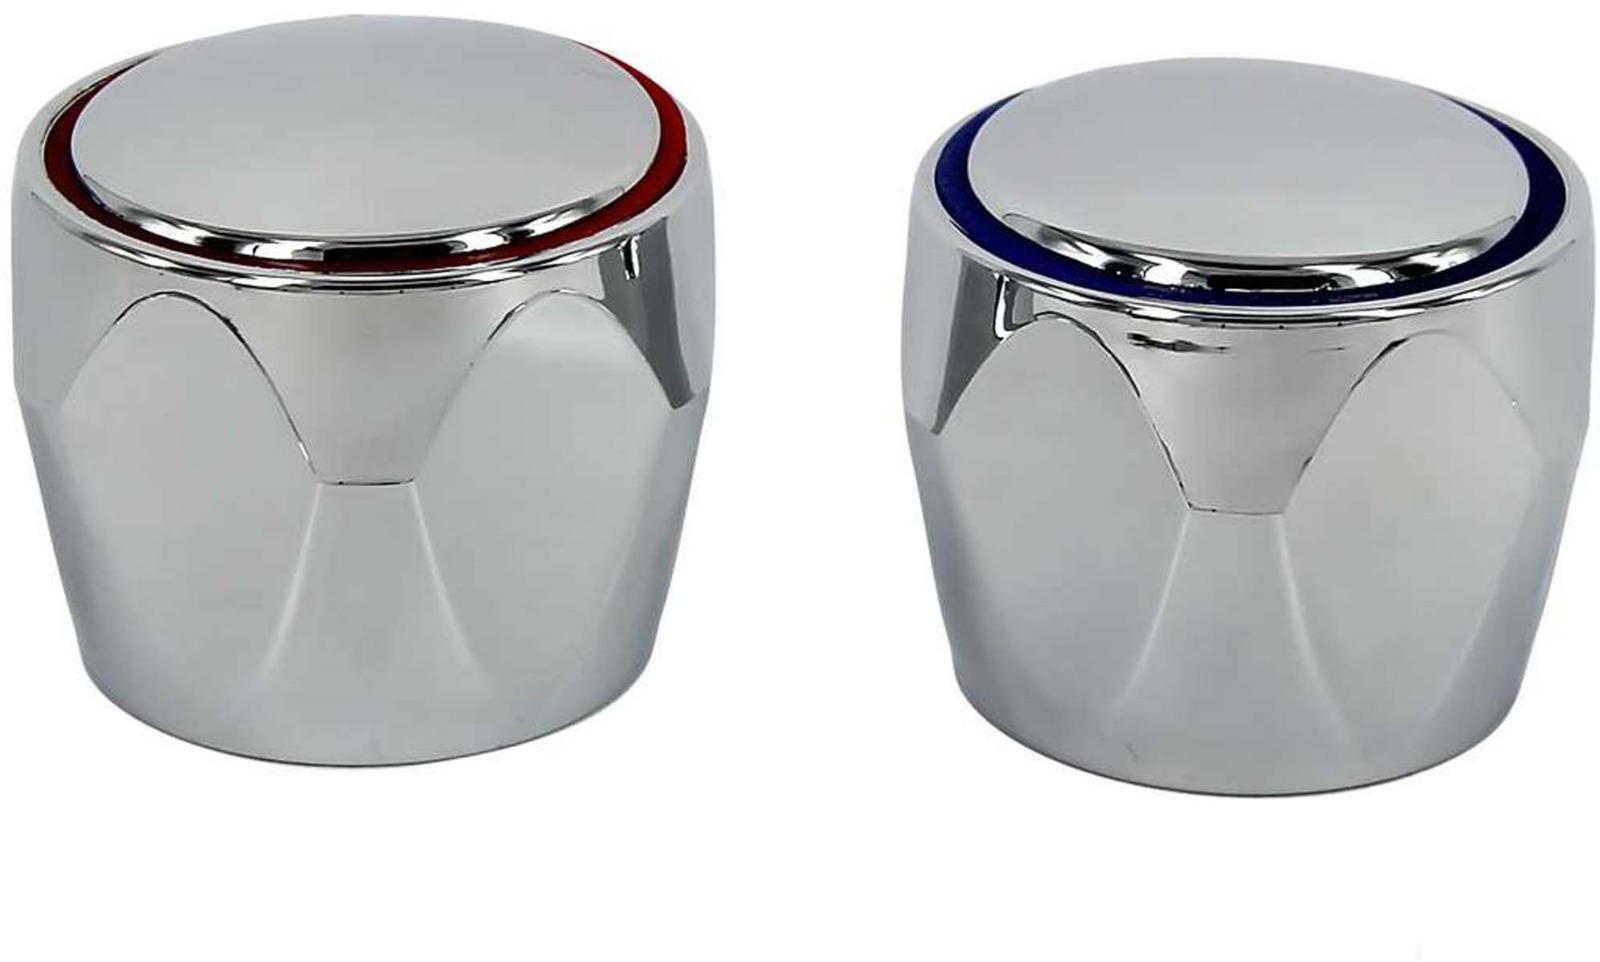 Маховик металлический MasterProf Глобо, 8 х 24, 20282, 2 шт, MP-У прокладка силиконовая masterprof 1 2 100 шт mp пакет